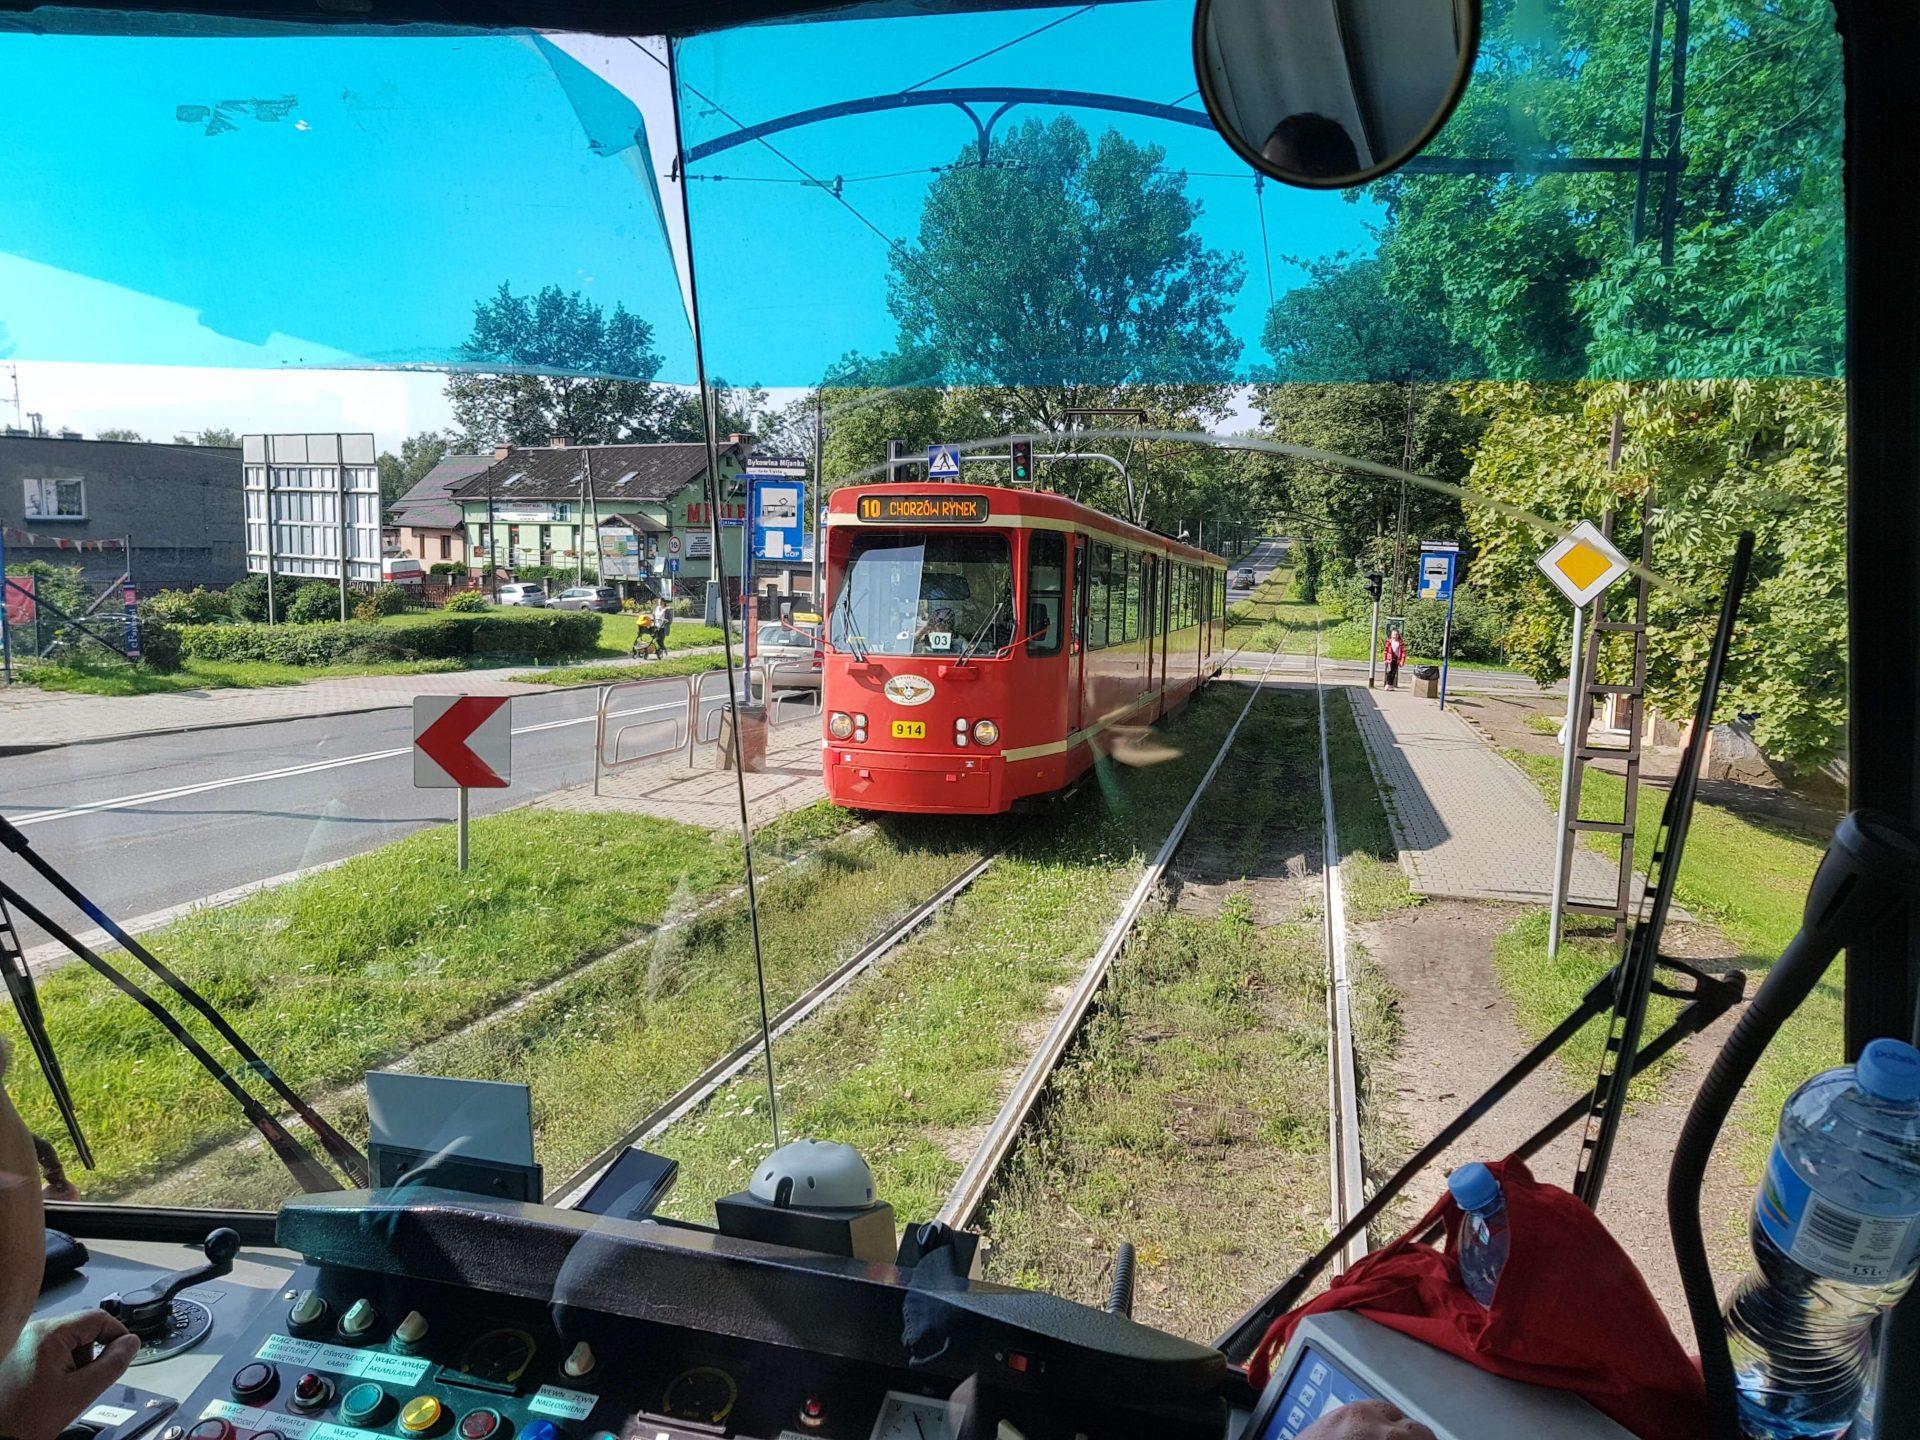 Rote Bahn in grüner Umgebung